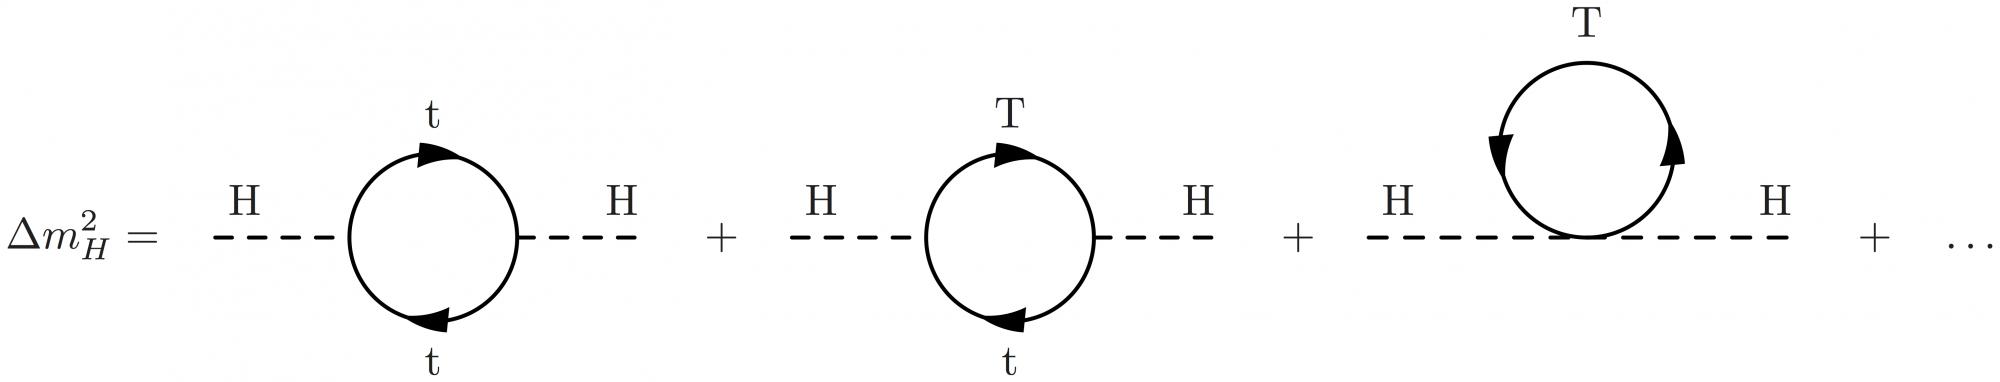 Latexfeynman cms wiki pages ccuart Choice Image